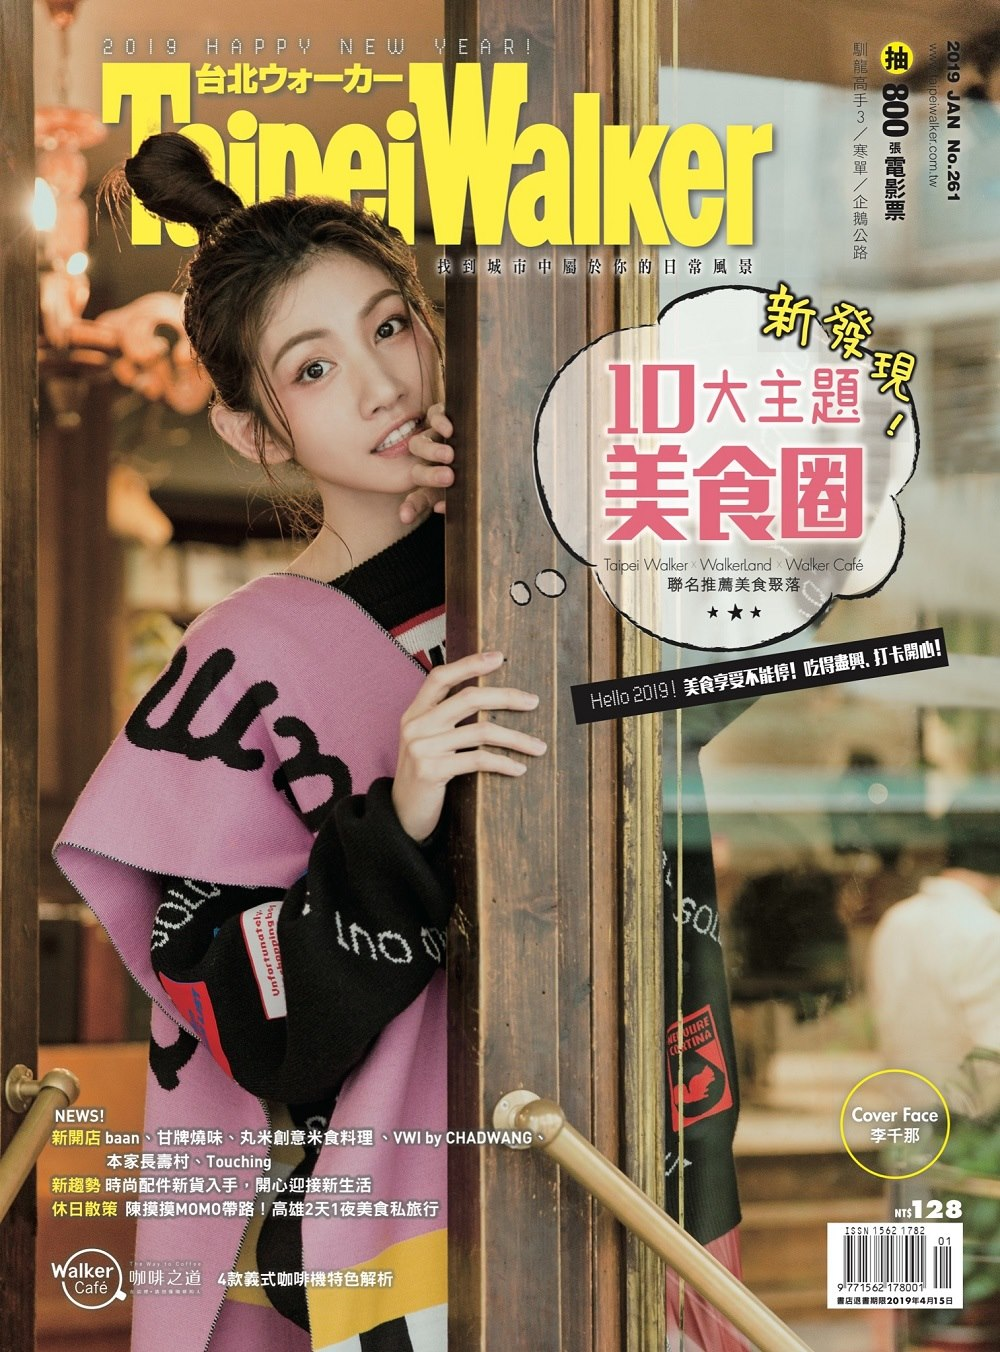 Taipei Walker 1月號/2019 第261期 贈:三星 J7 prime玻璃保護貼